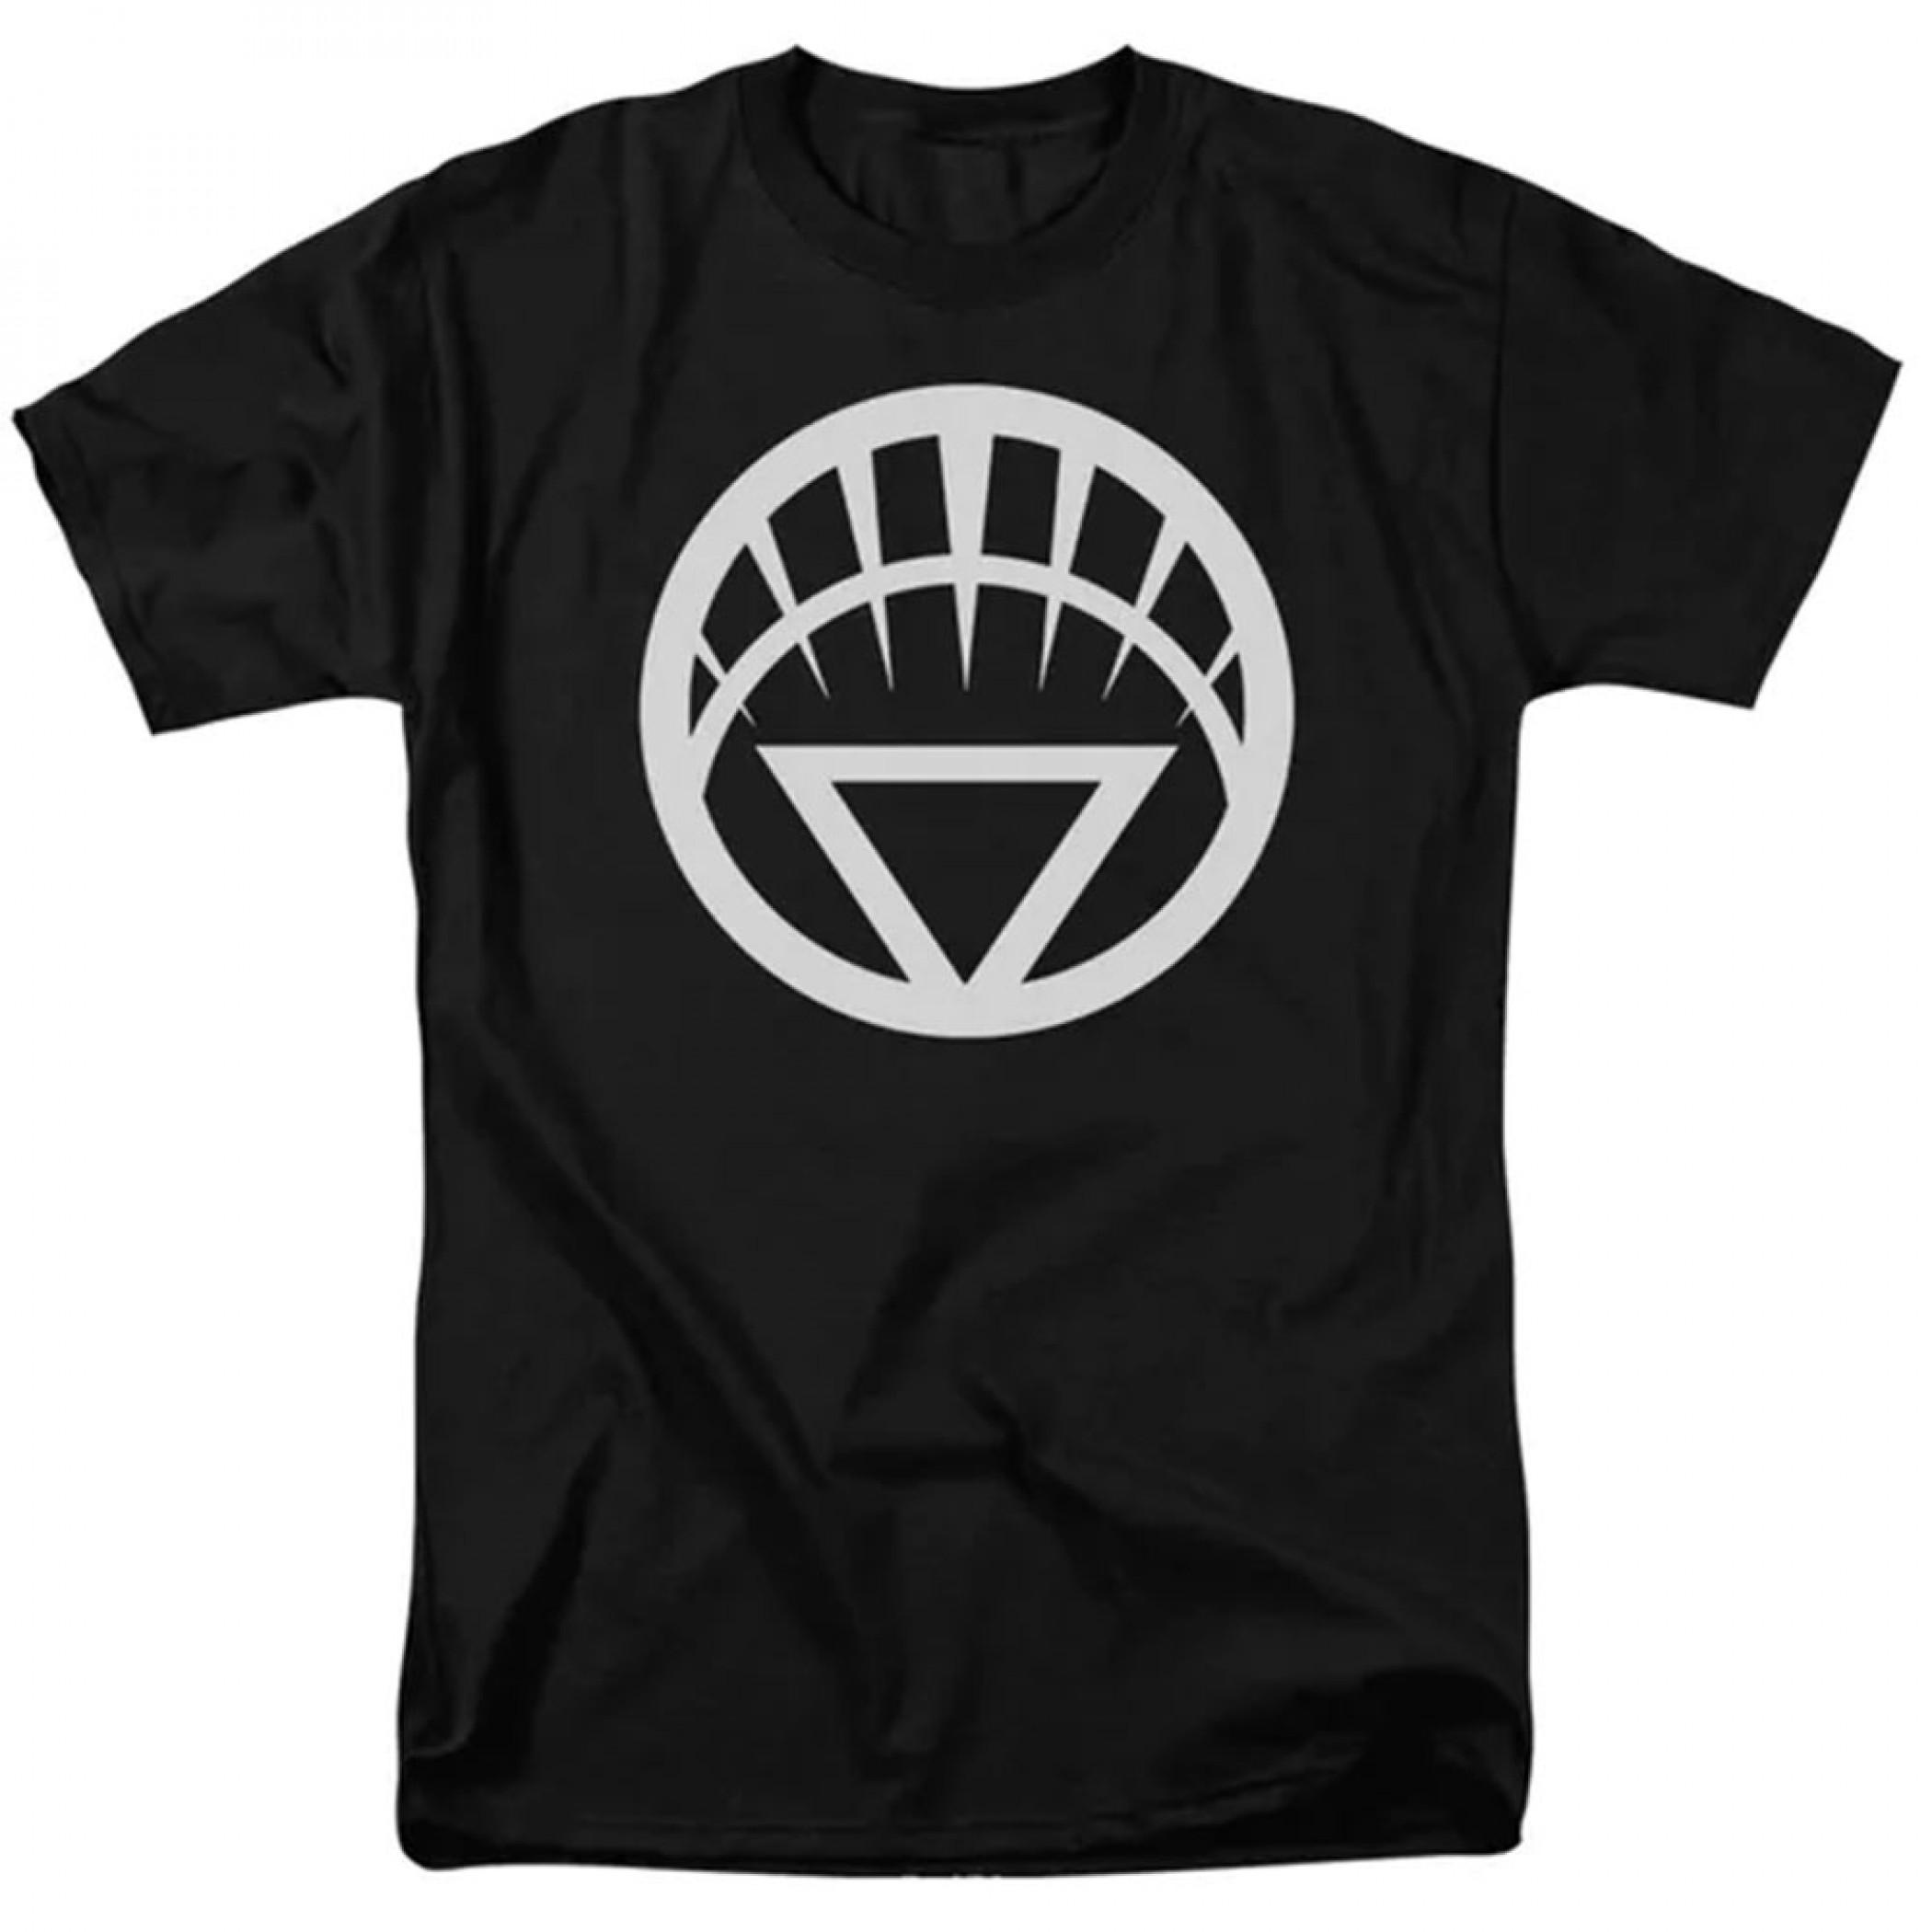 Green Lantern White Lantern Symbol Men's Black T-Shirt